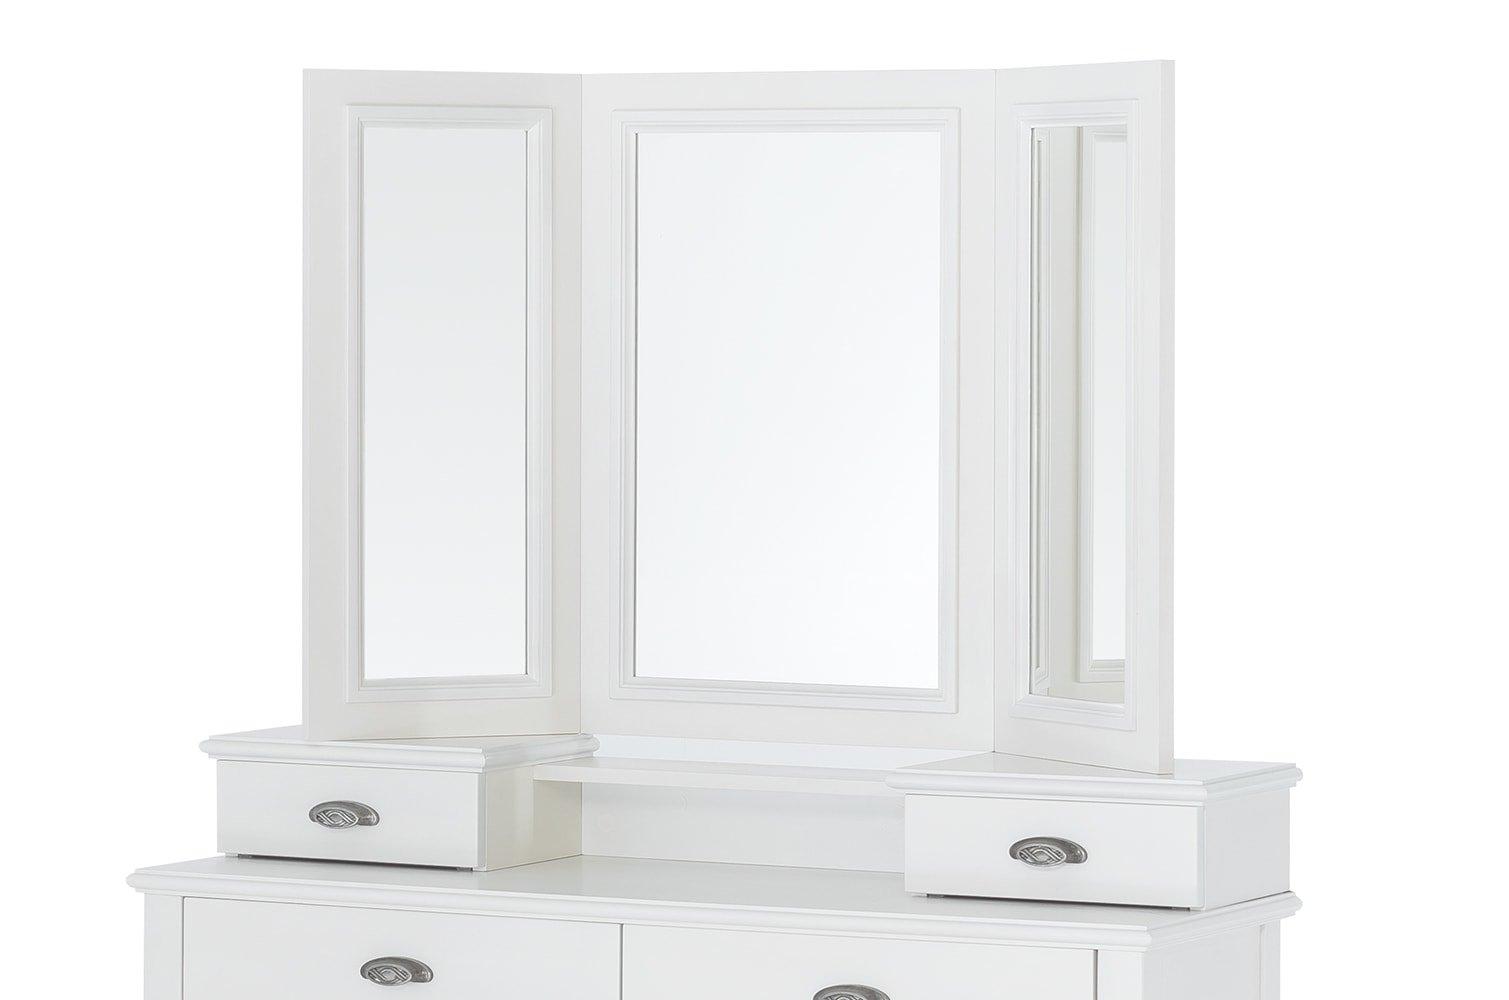 Oglinda decorativa din furnir si pal Madison 25 Alb, L112xl72 cm imagine